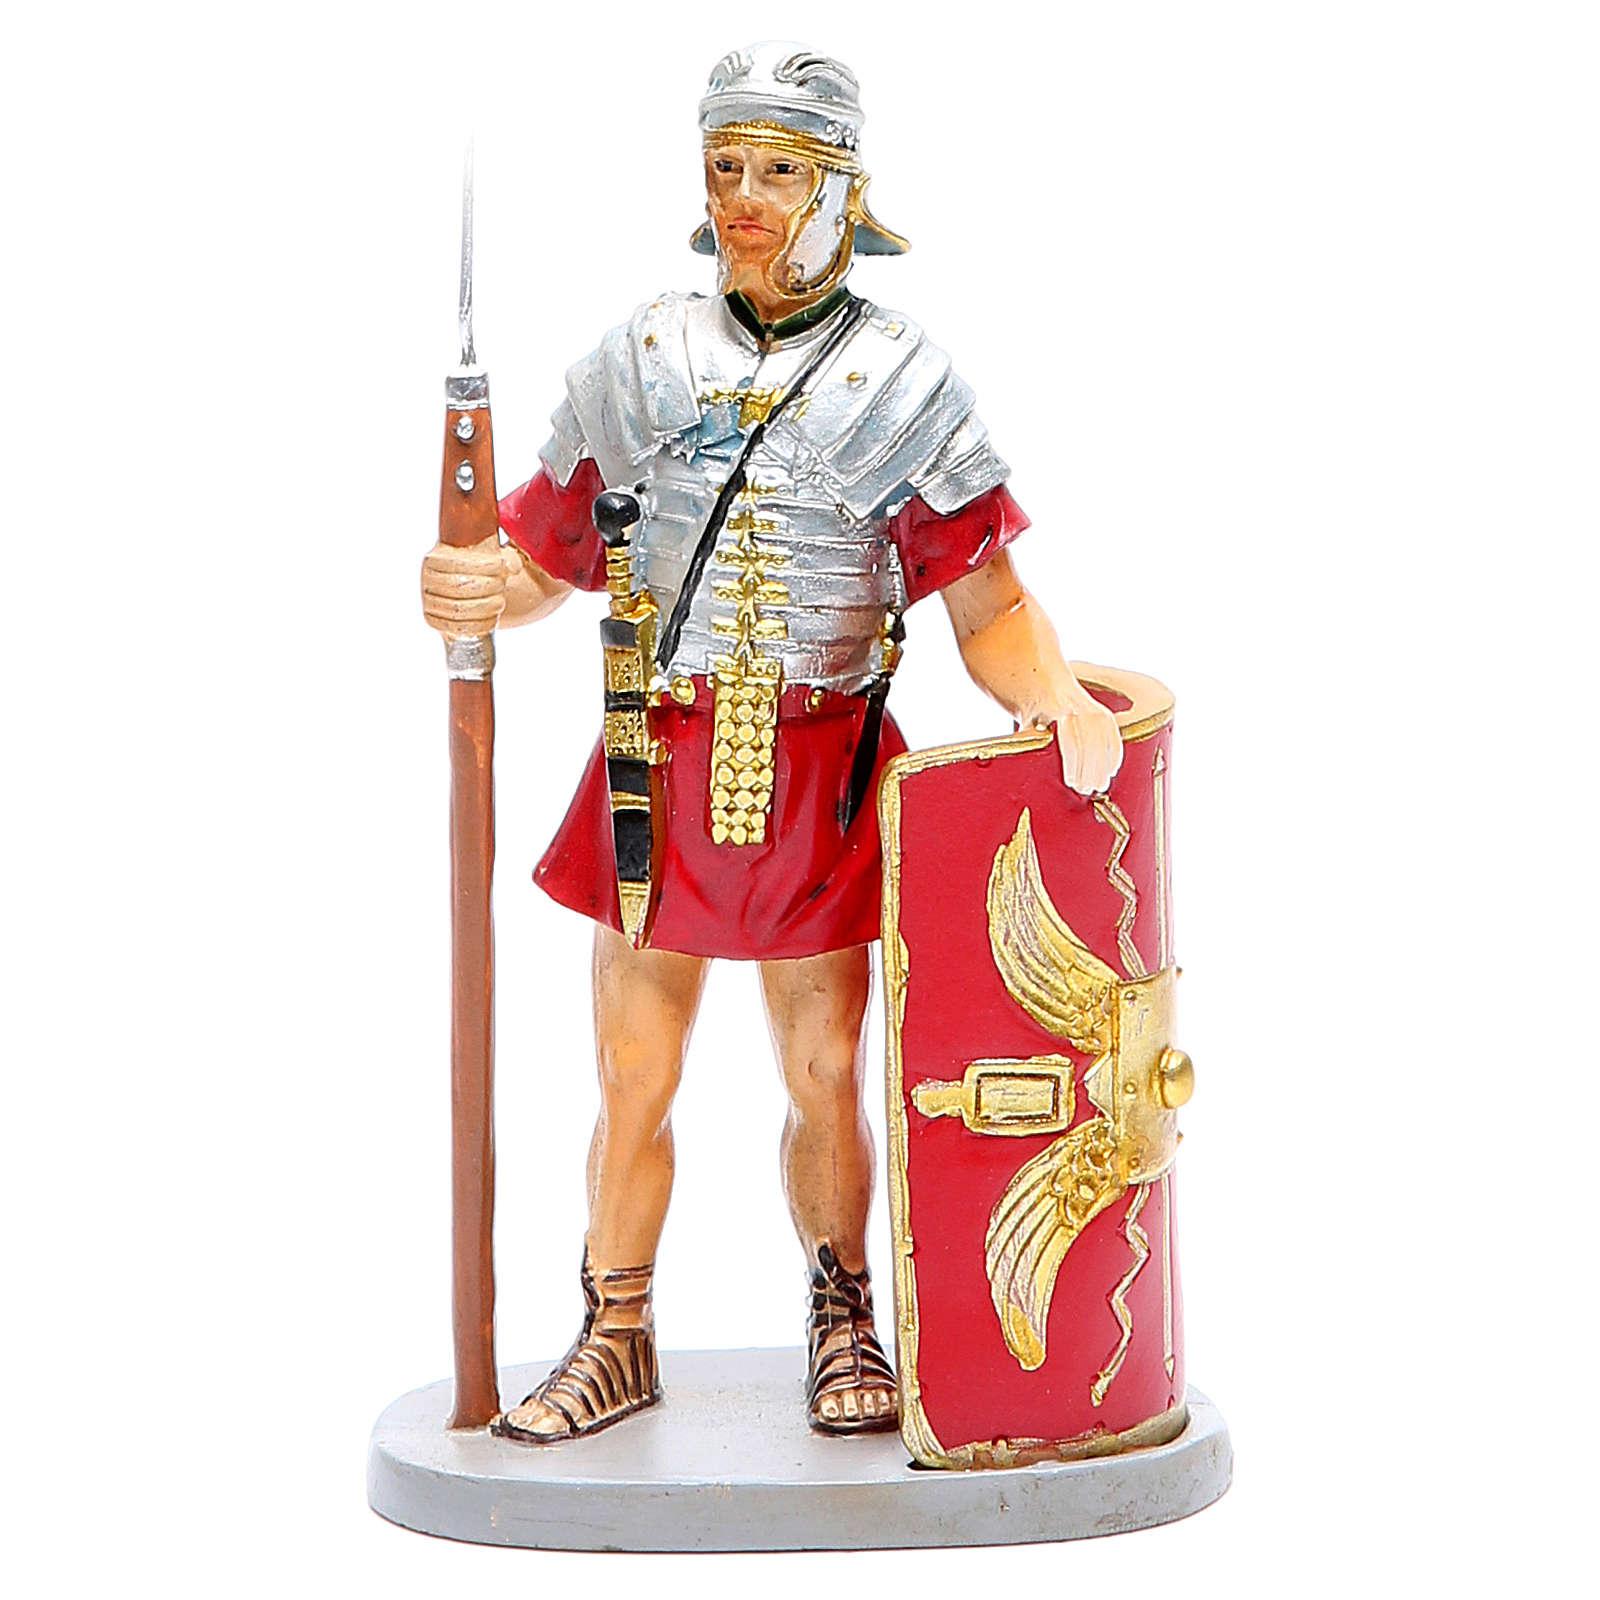 Soldat avec bouclier 12 cm gamme Martino Landi 3